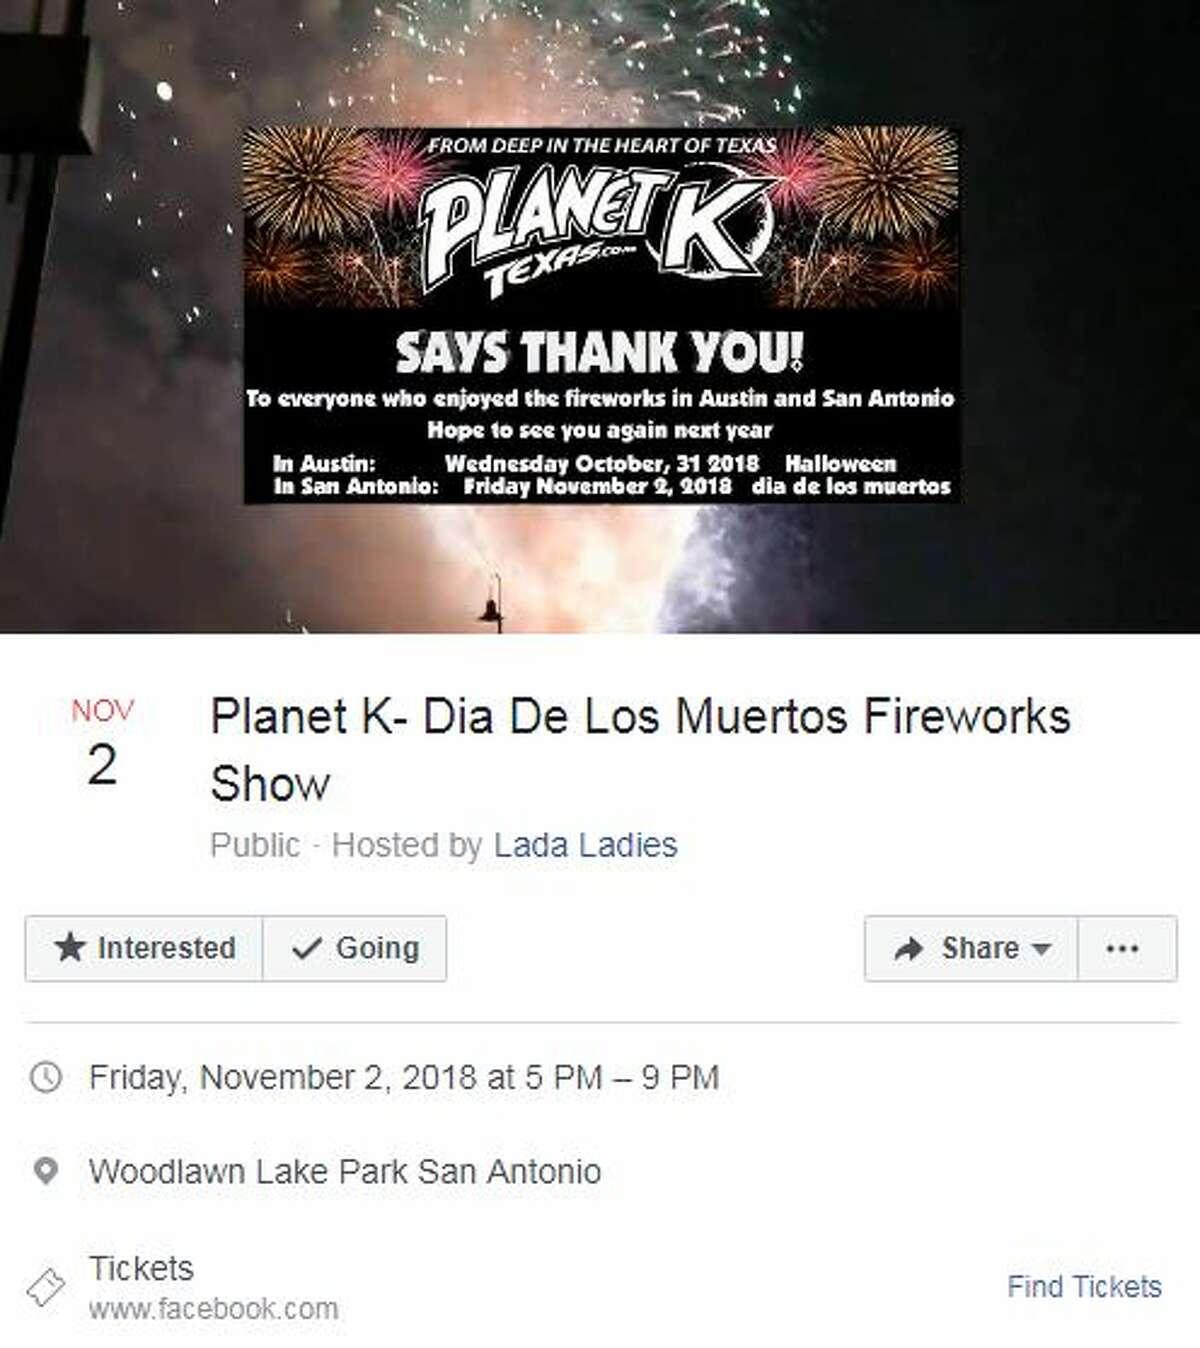 Planet K- Dia de los Muertos Fireworks Show Nov. 2, 5-9 p.m.Woodlawn Lake Park San AntonioHosted by Lada LadiesMore detailshere